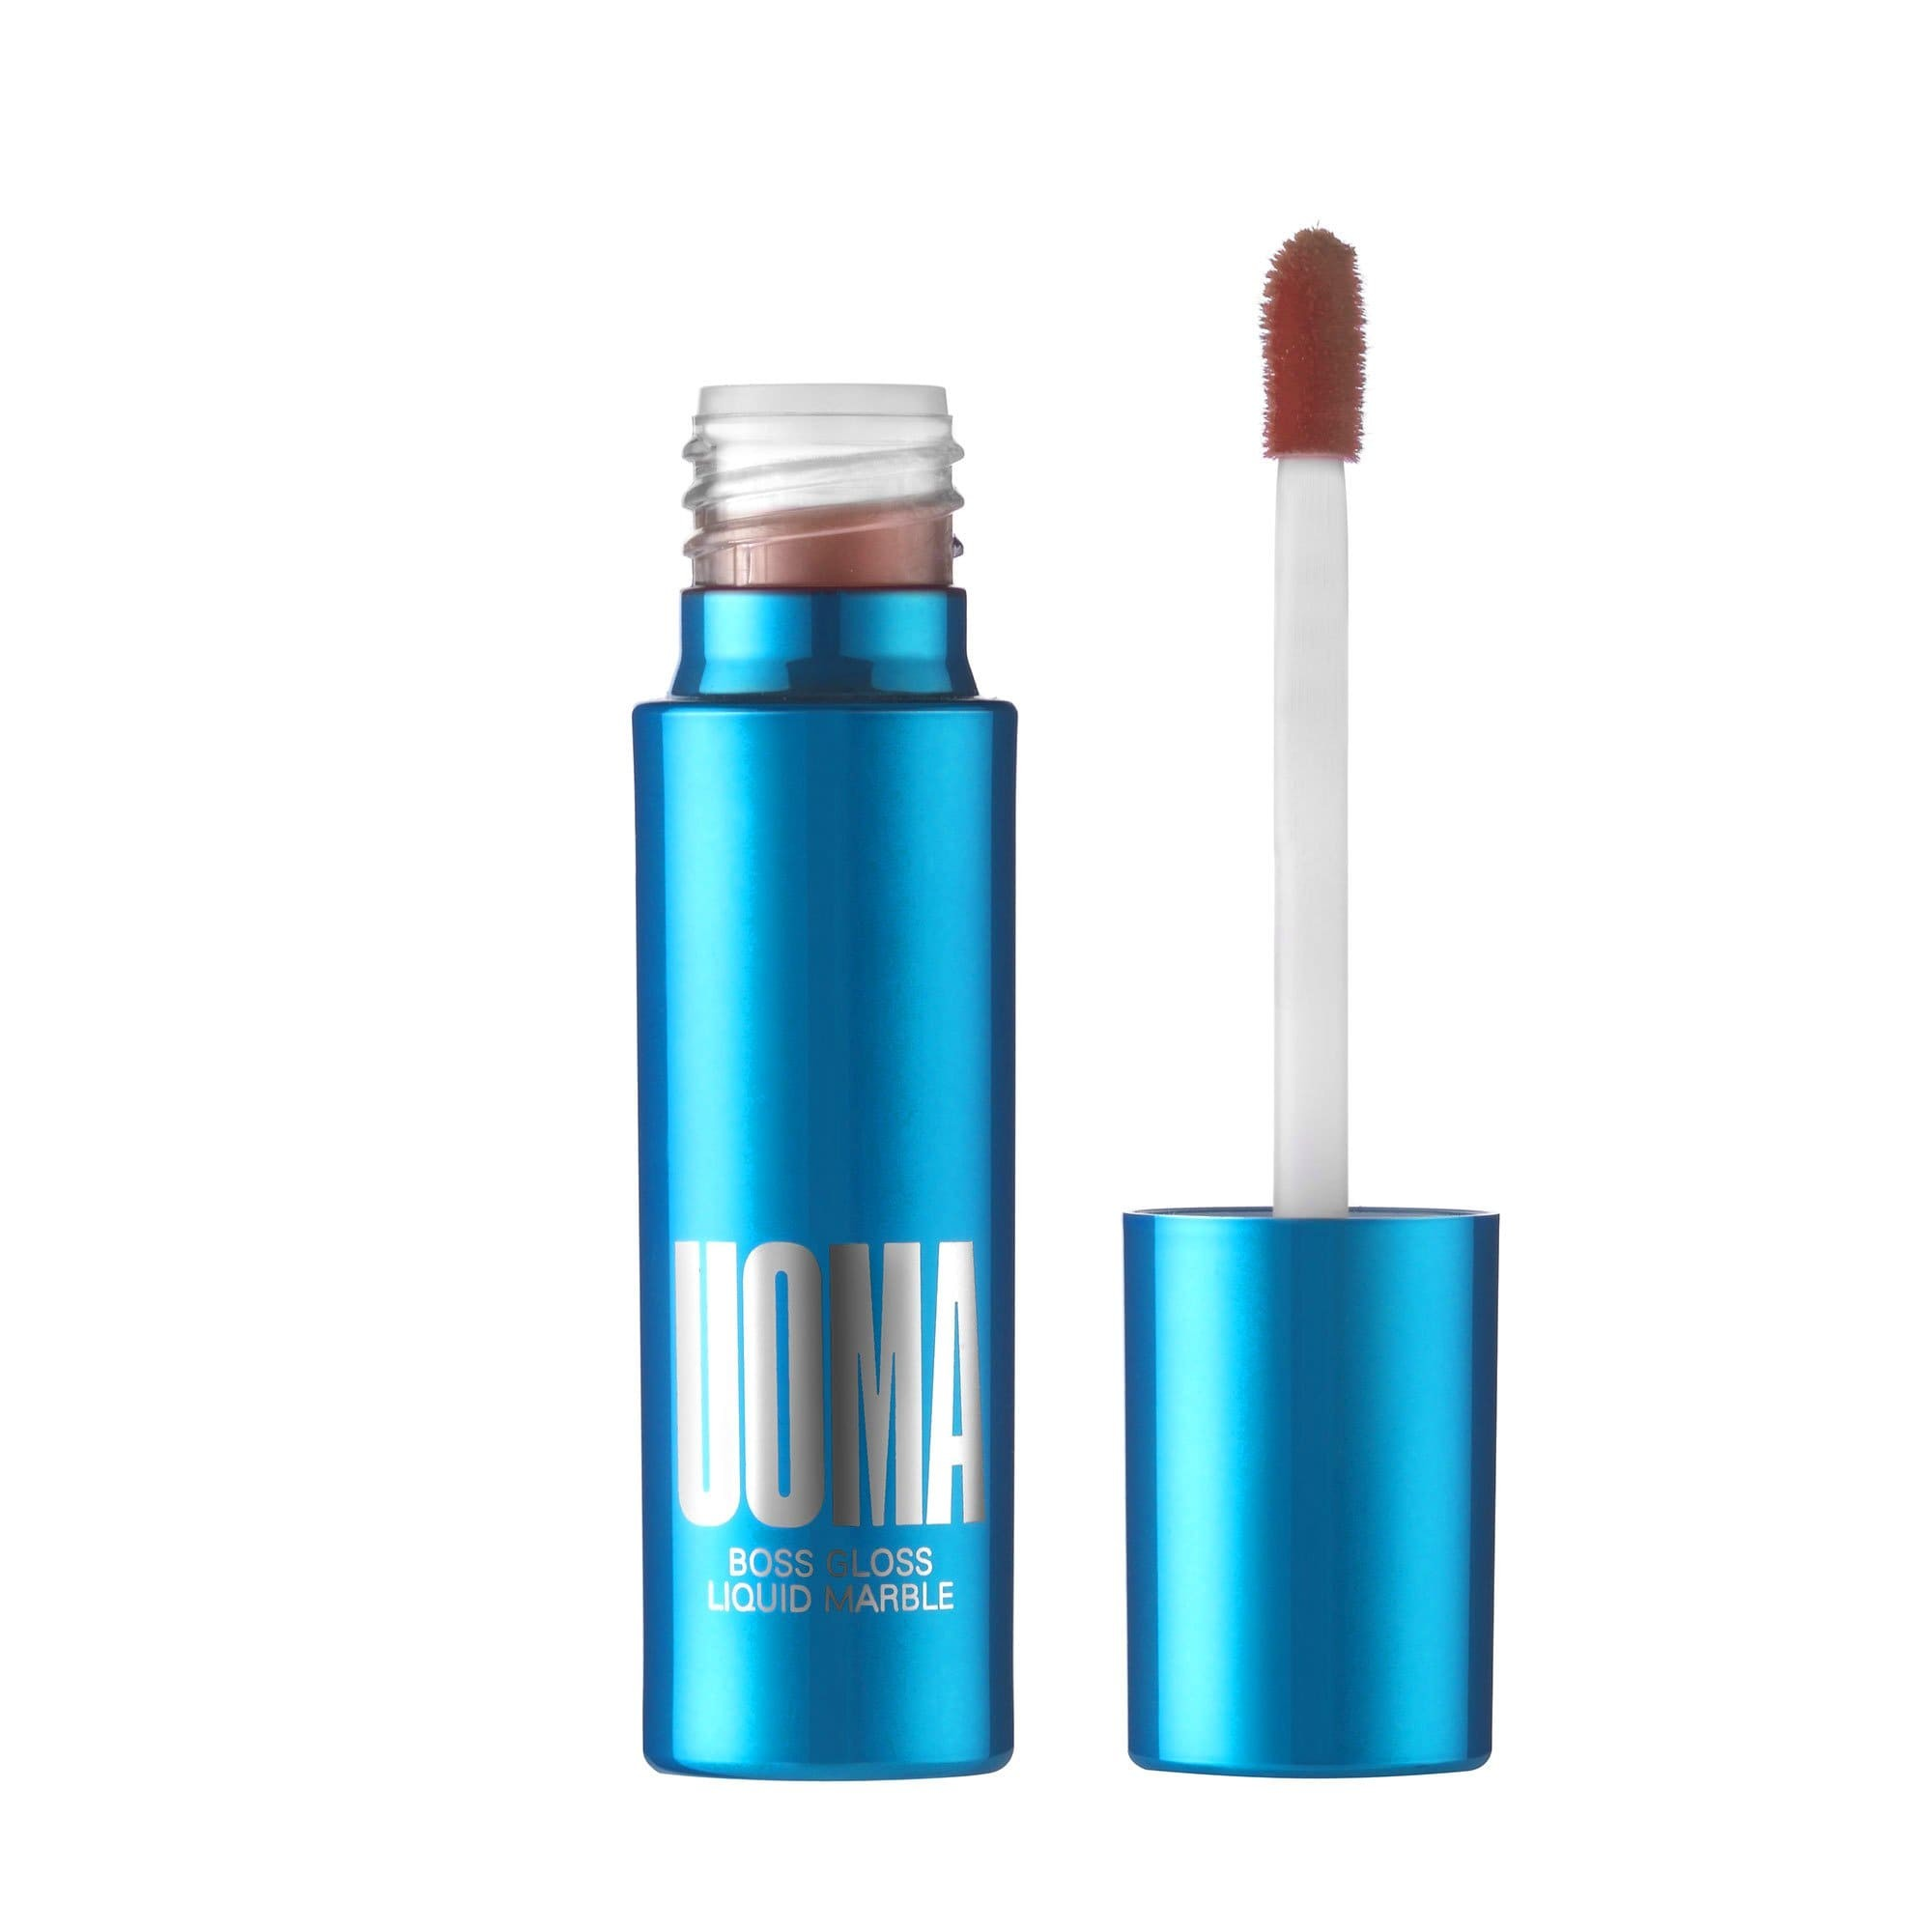 Uoma Beauty Boss Gloss Liquid Marble Lip Gloss Passion